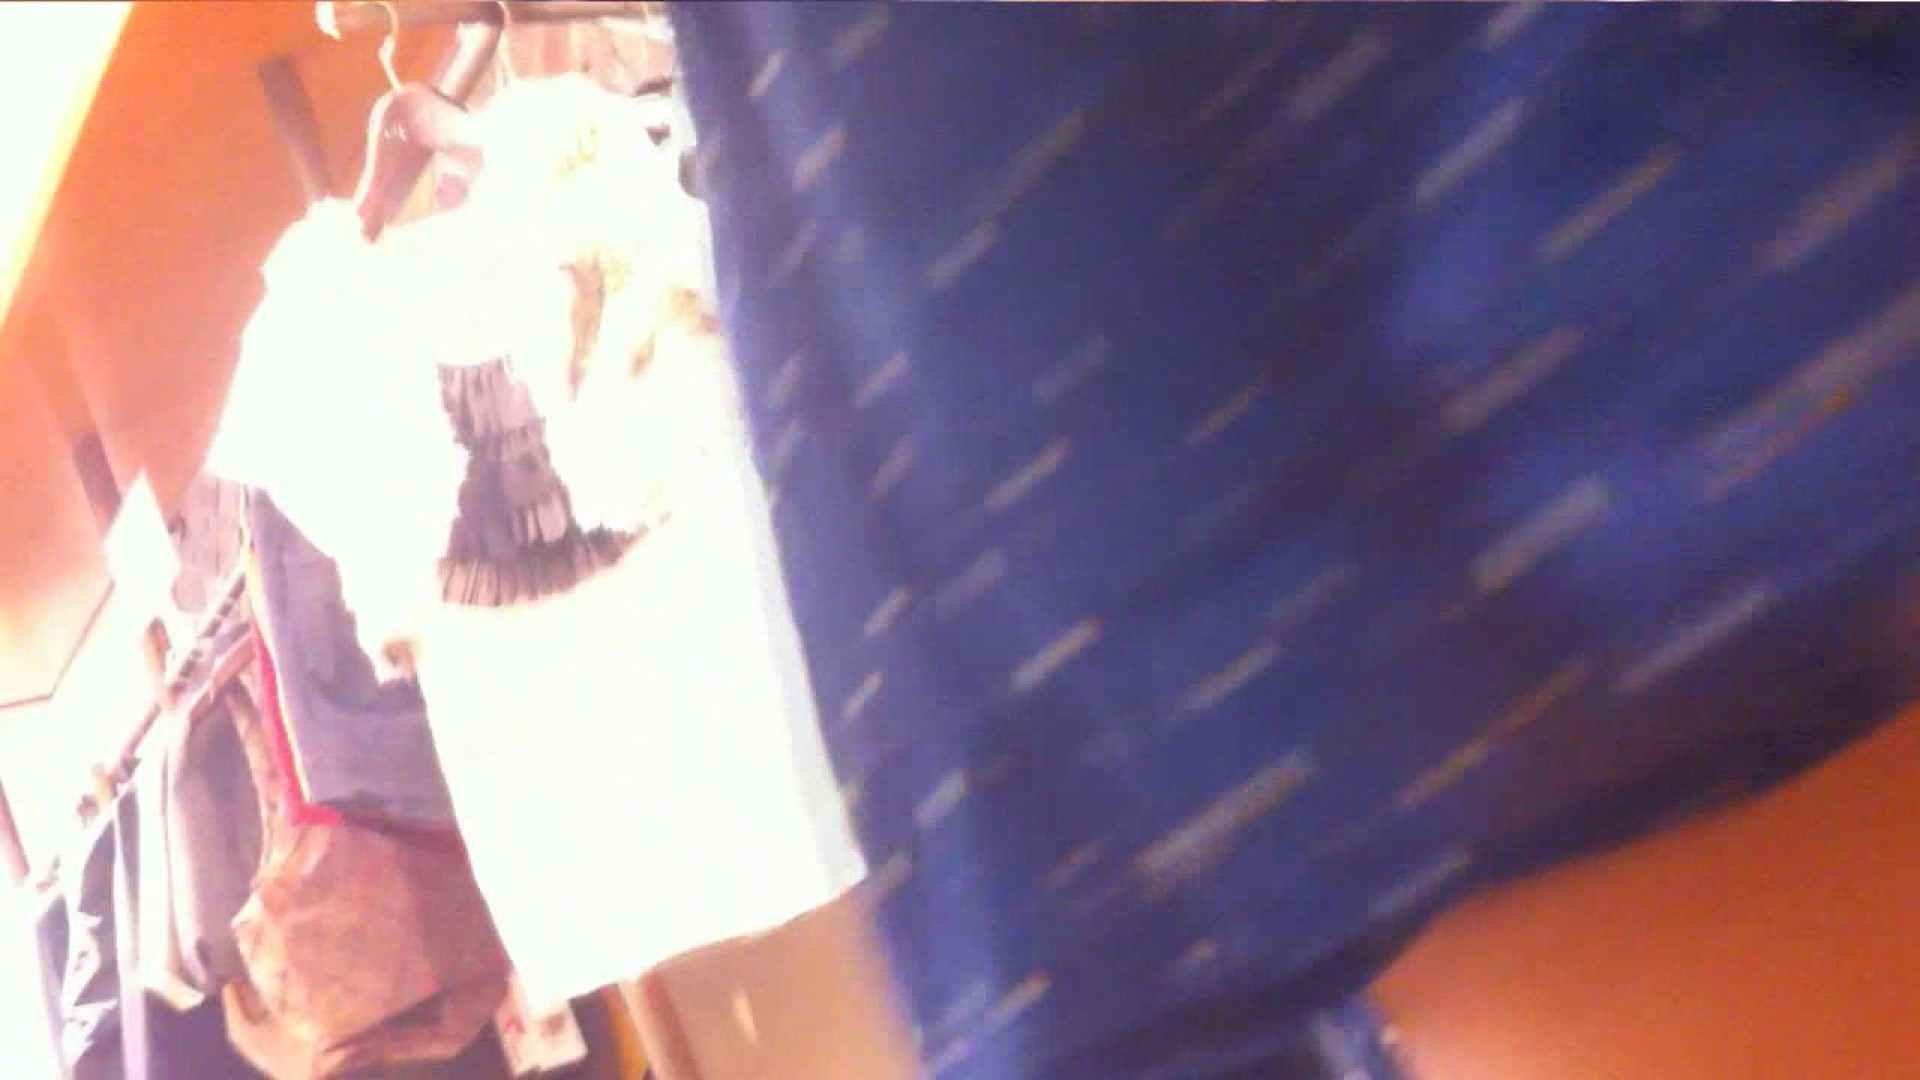 vol.34 美人アパレル胸チラ&パンチラ メガネ属性っていいよね♥ チラ歓迎 戯れ無修正画像 104pic 27